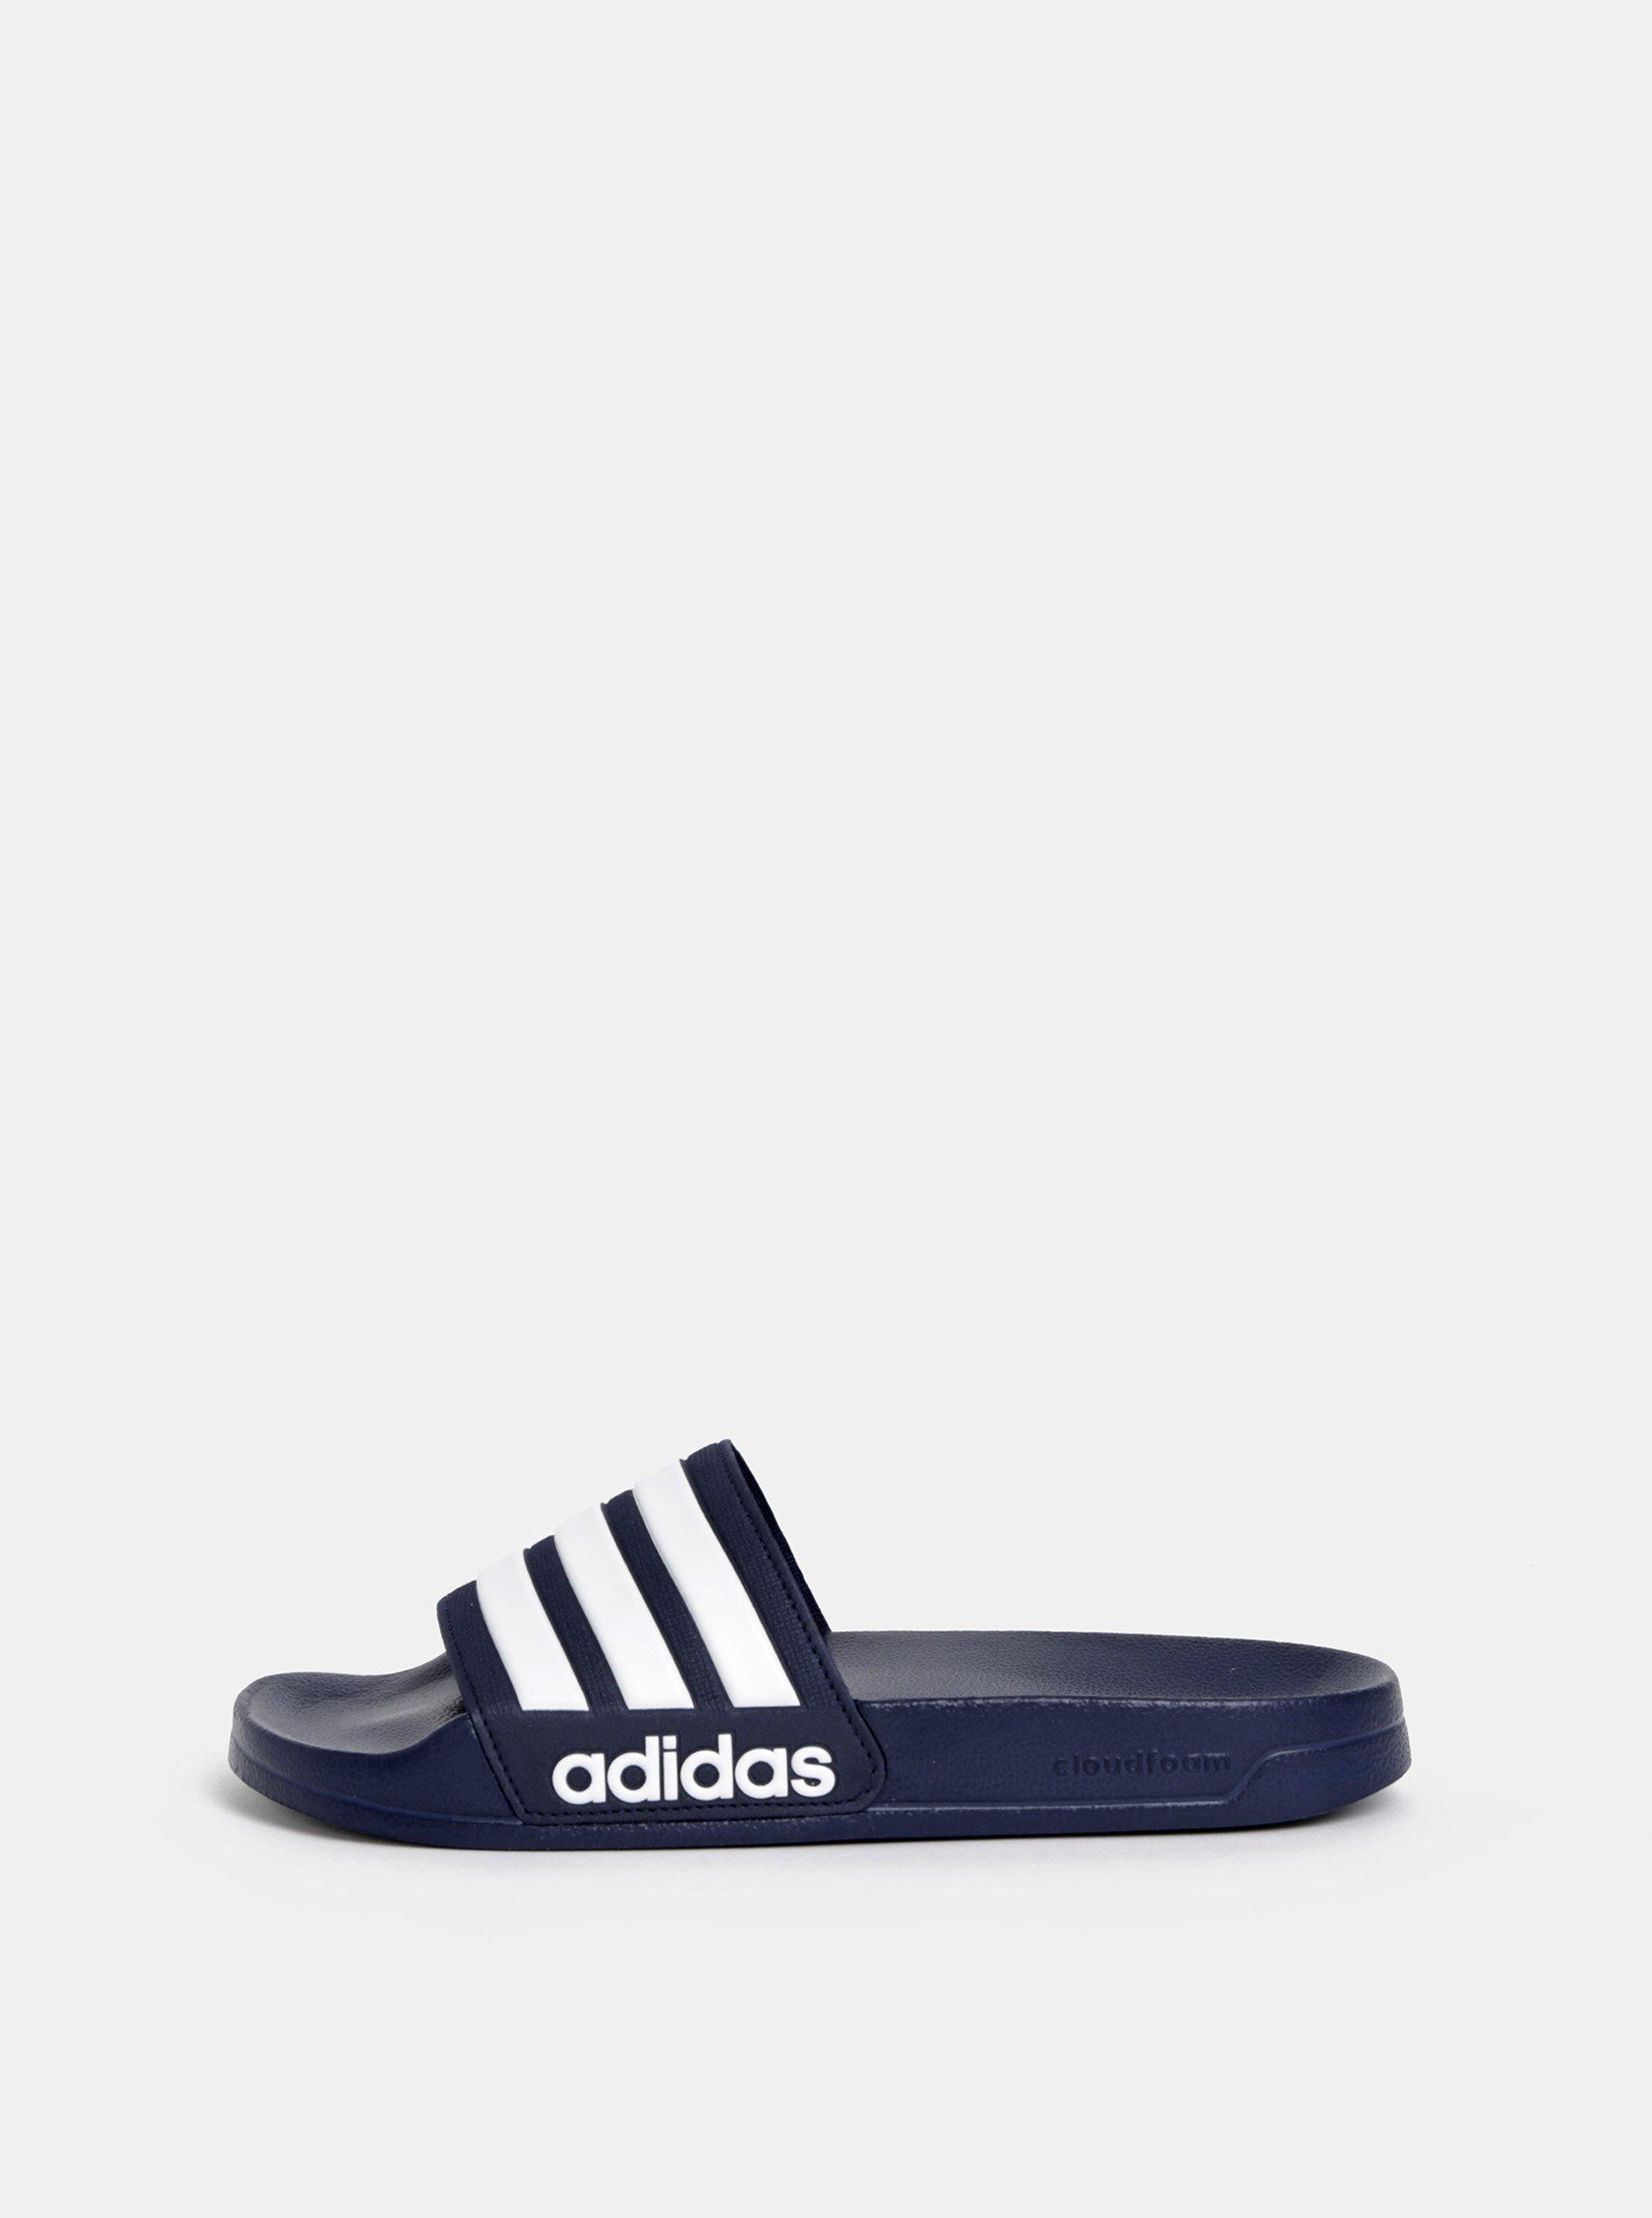 46518dd30 Tmavě modré pánské pruhované pantofle adidas CORE Adilette Shower